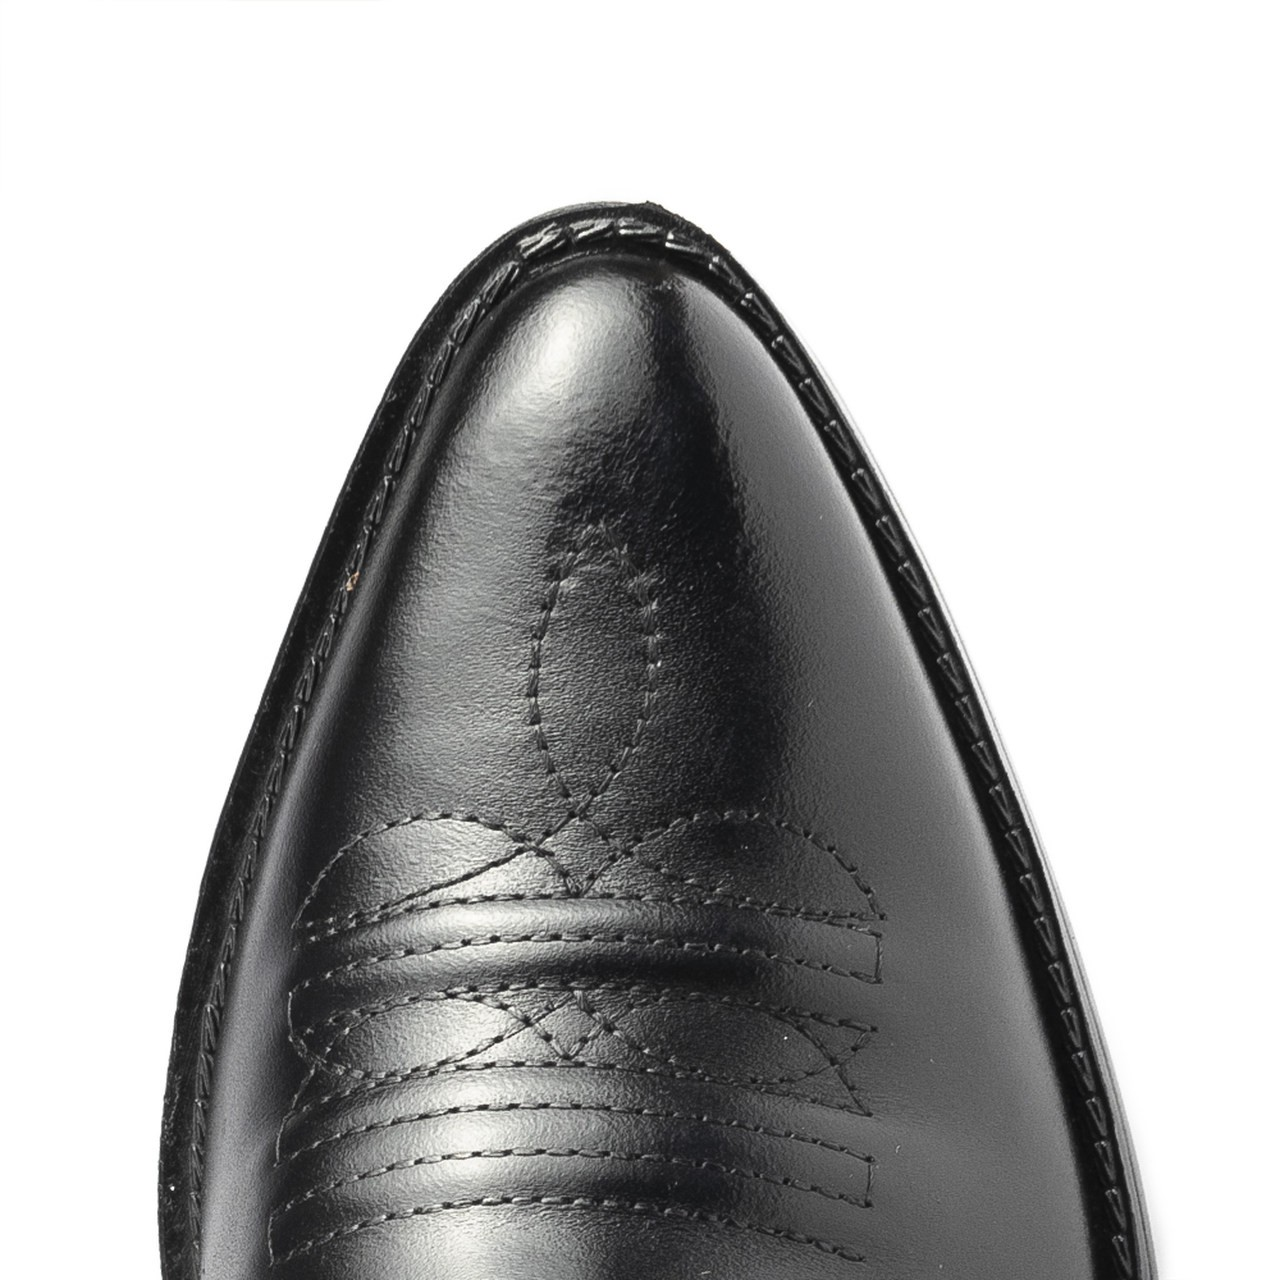 Bota Masculina Country Texana HB Agabe Boots 100.000 - Lt Preto - Sola de Couro Com Borracha